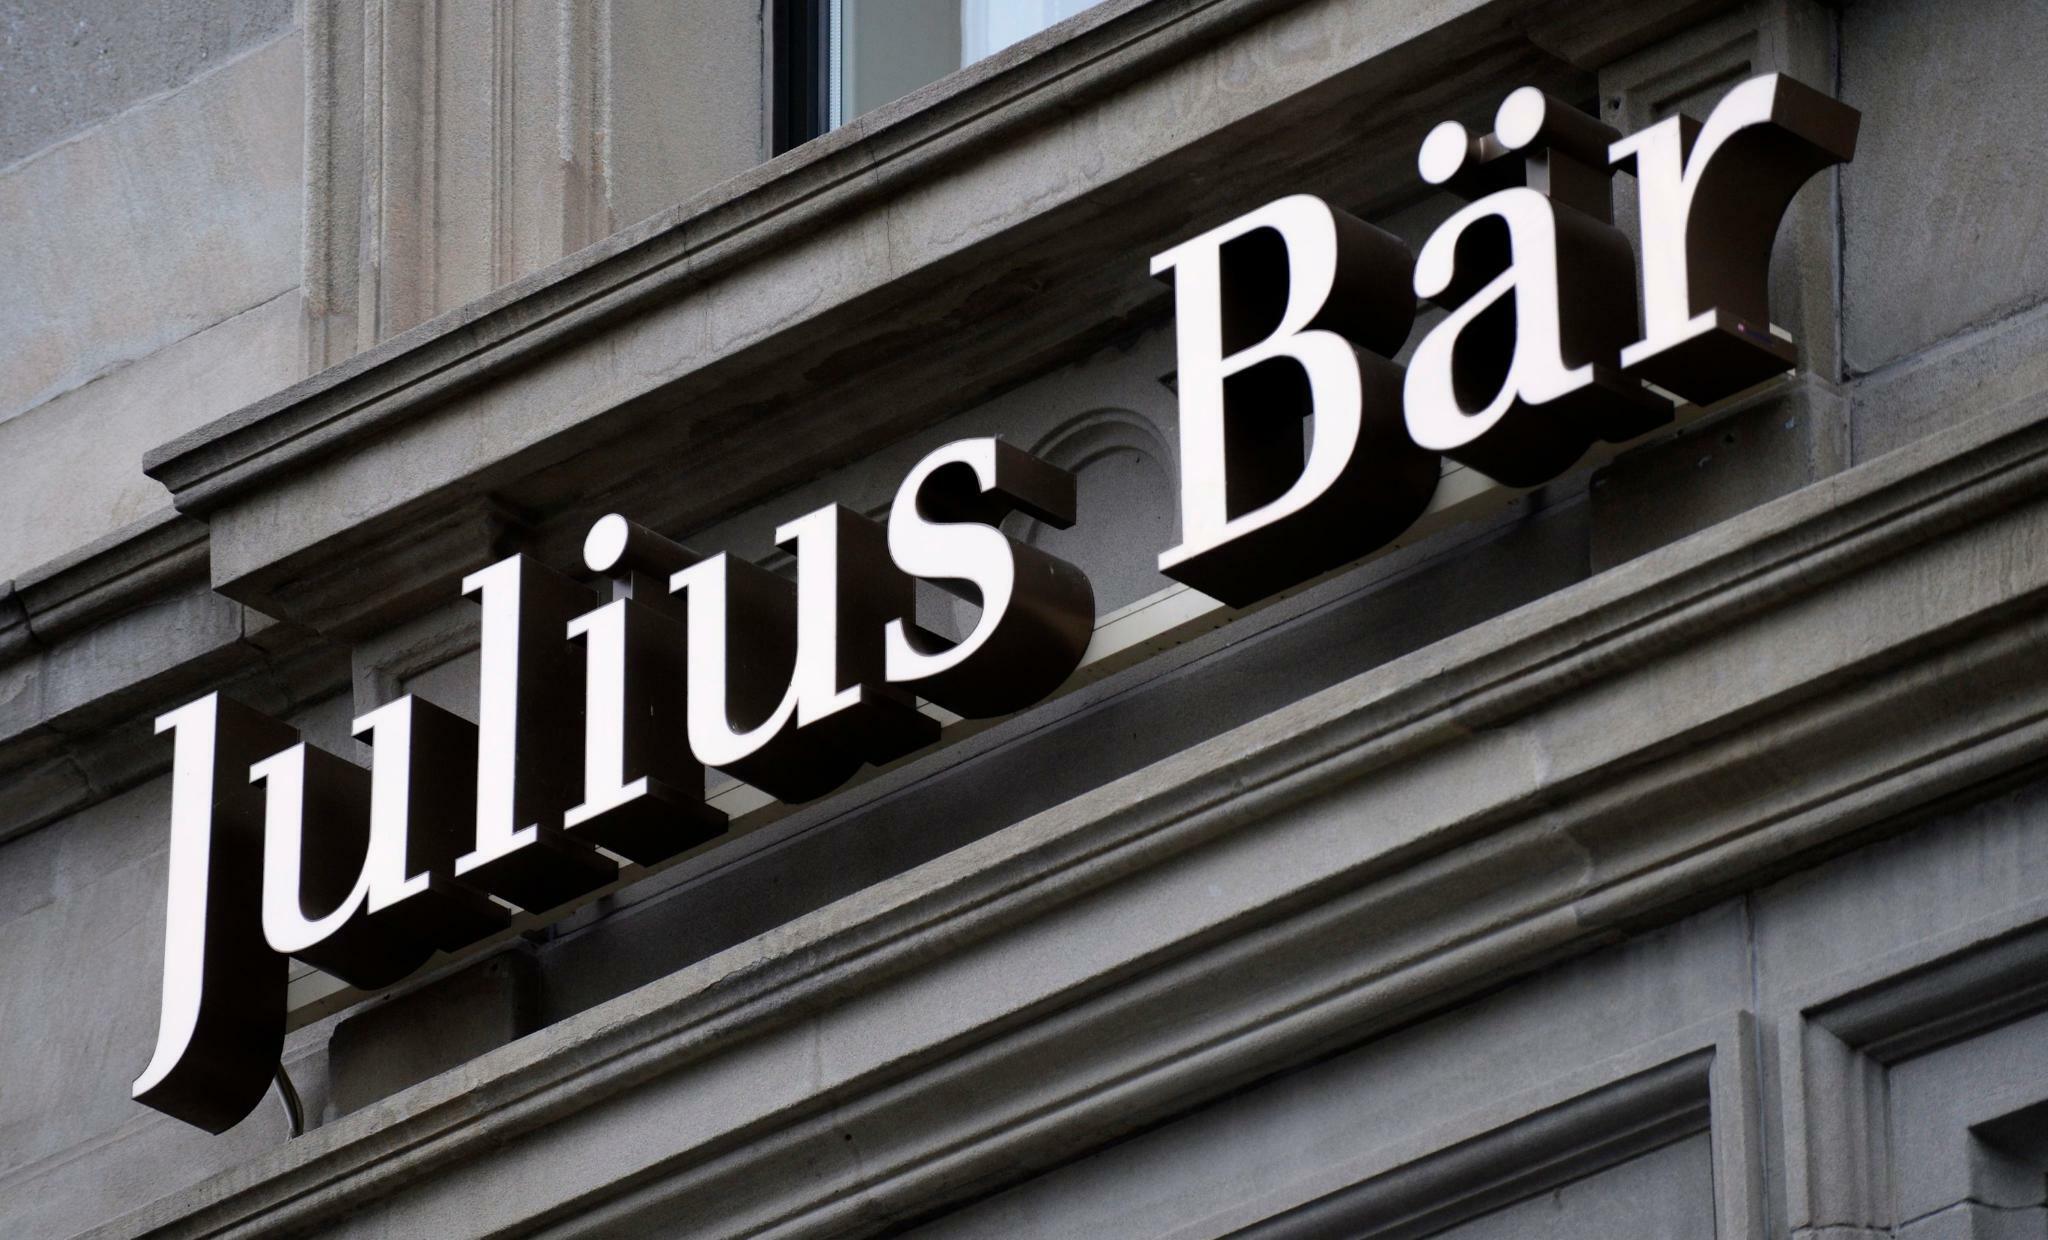 Vermögensverwalter: Privatbank Julius Bär warnt vor Wachstumsabschwächung